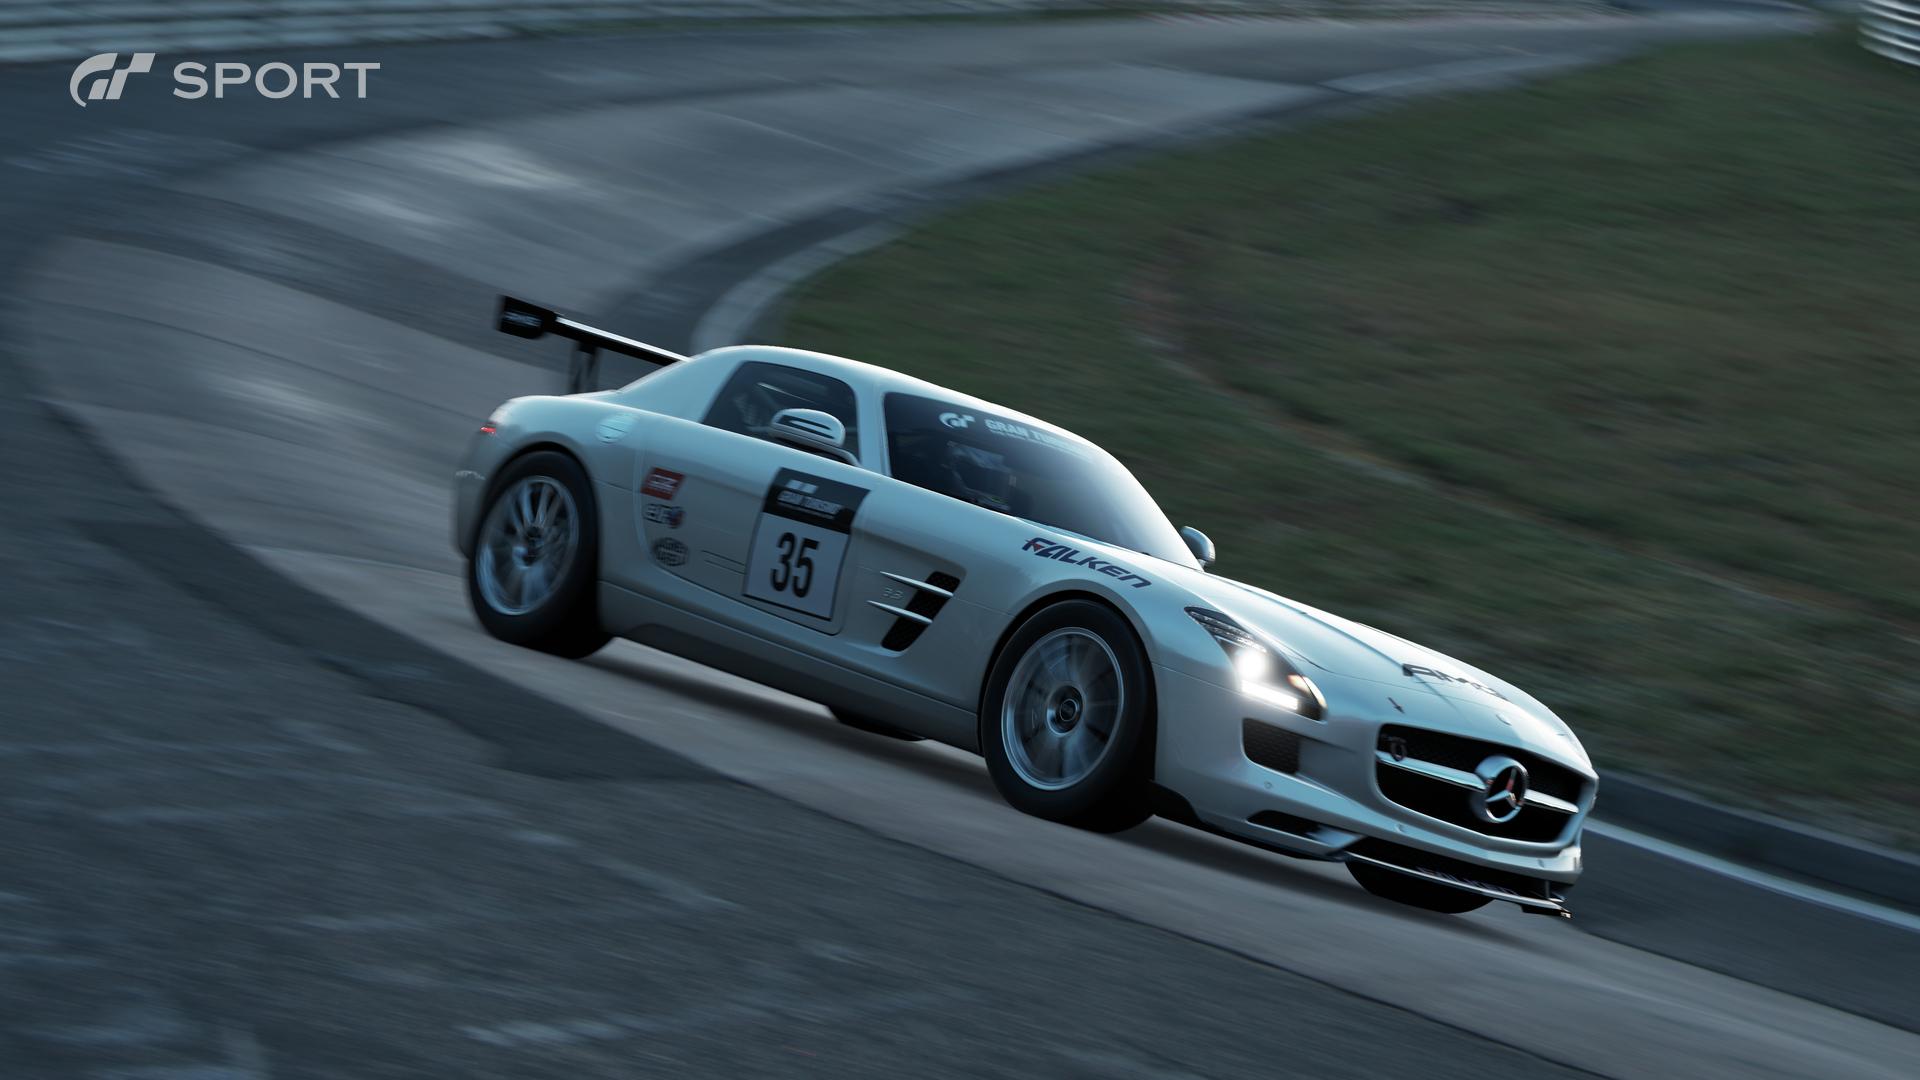 Car Brands Starting With T >> Polyphony Digital Reveals Massive Gran Turismo Sport Gallery – VirtualR.net – Sim Racing News